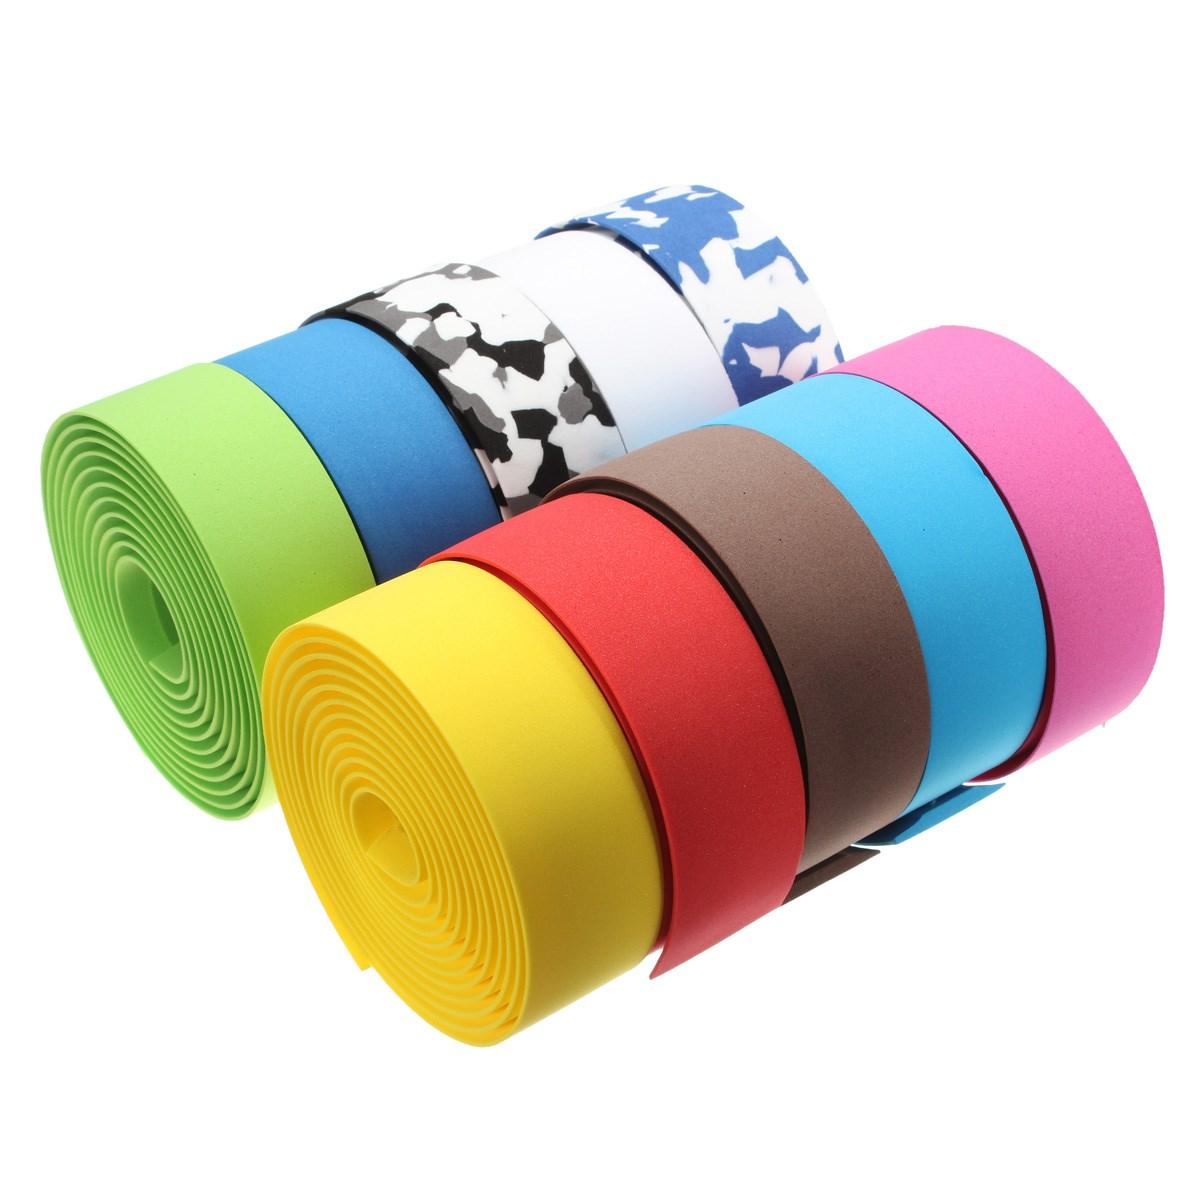 Hot Sale 2015 New Arrival High Quality Colorful Cycling Handle Belt Bike Bicycle Cork Handlebar Tape